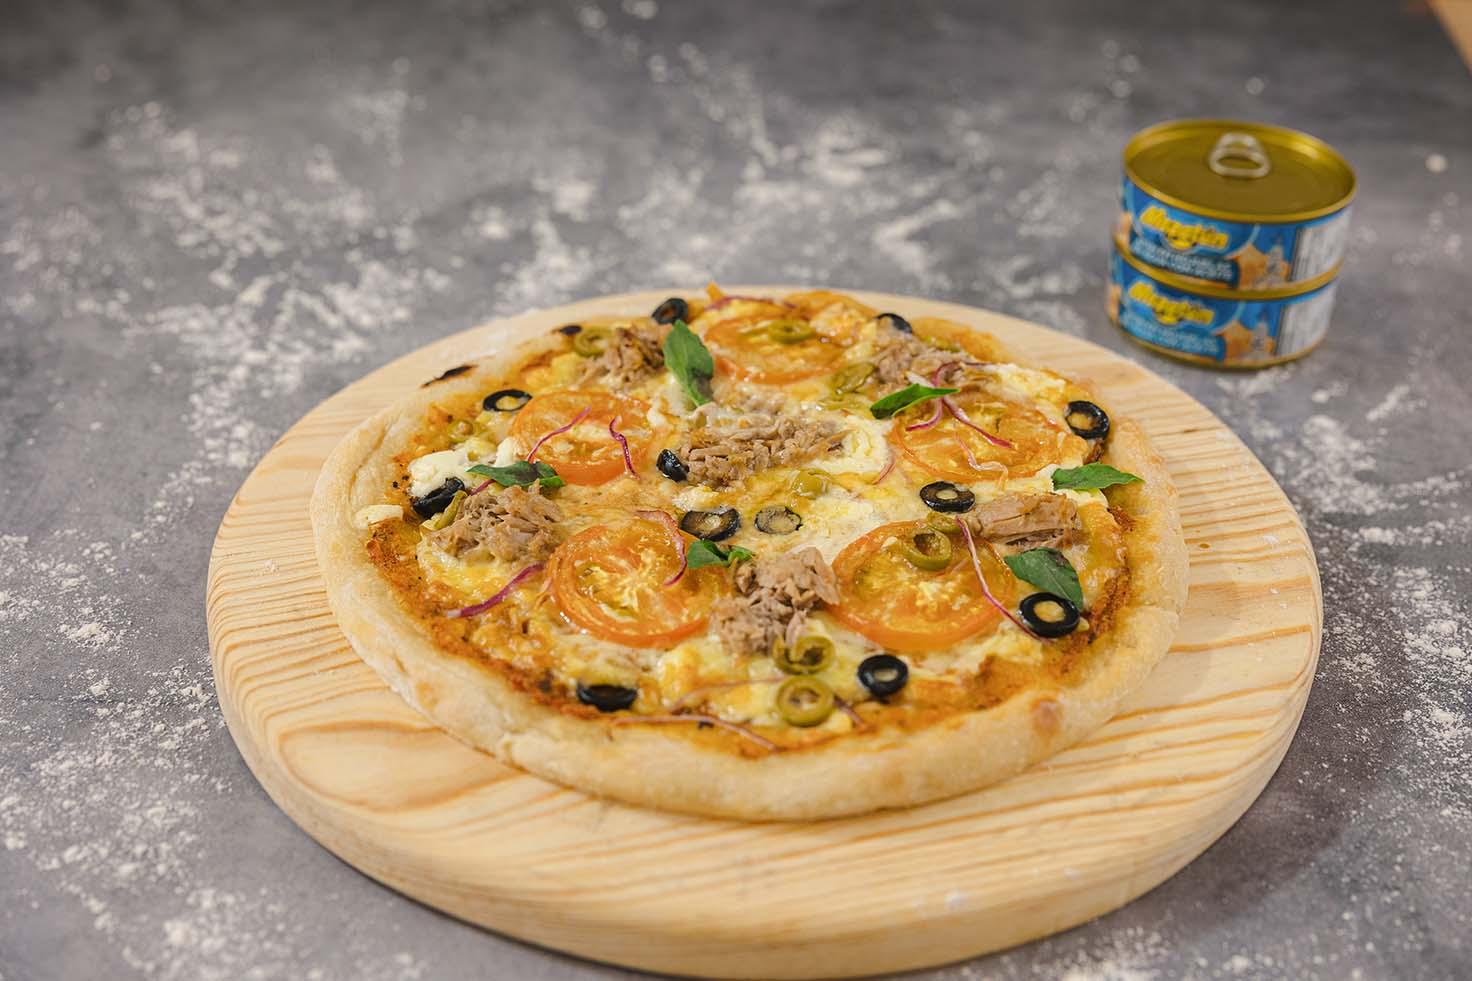 0045_Mazatún_Recetas2021_PROD1_Pizza_Stock_AR6_2683